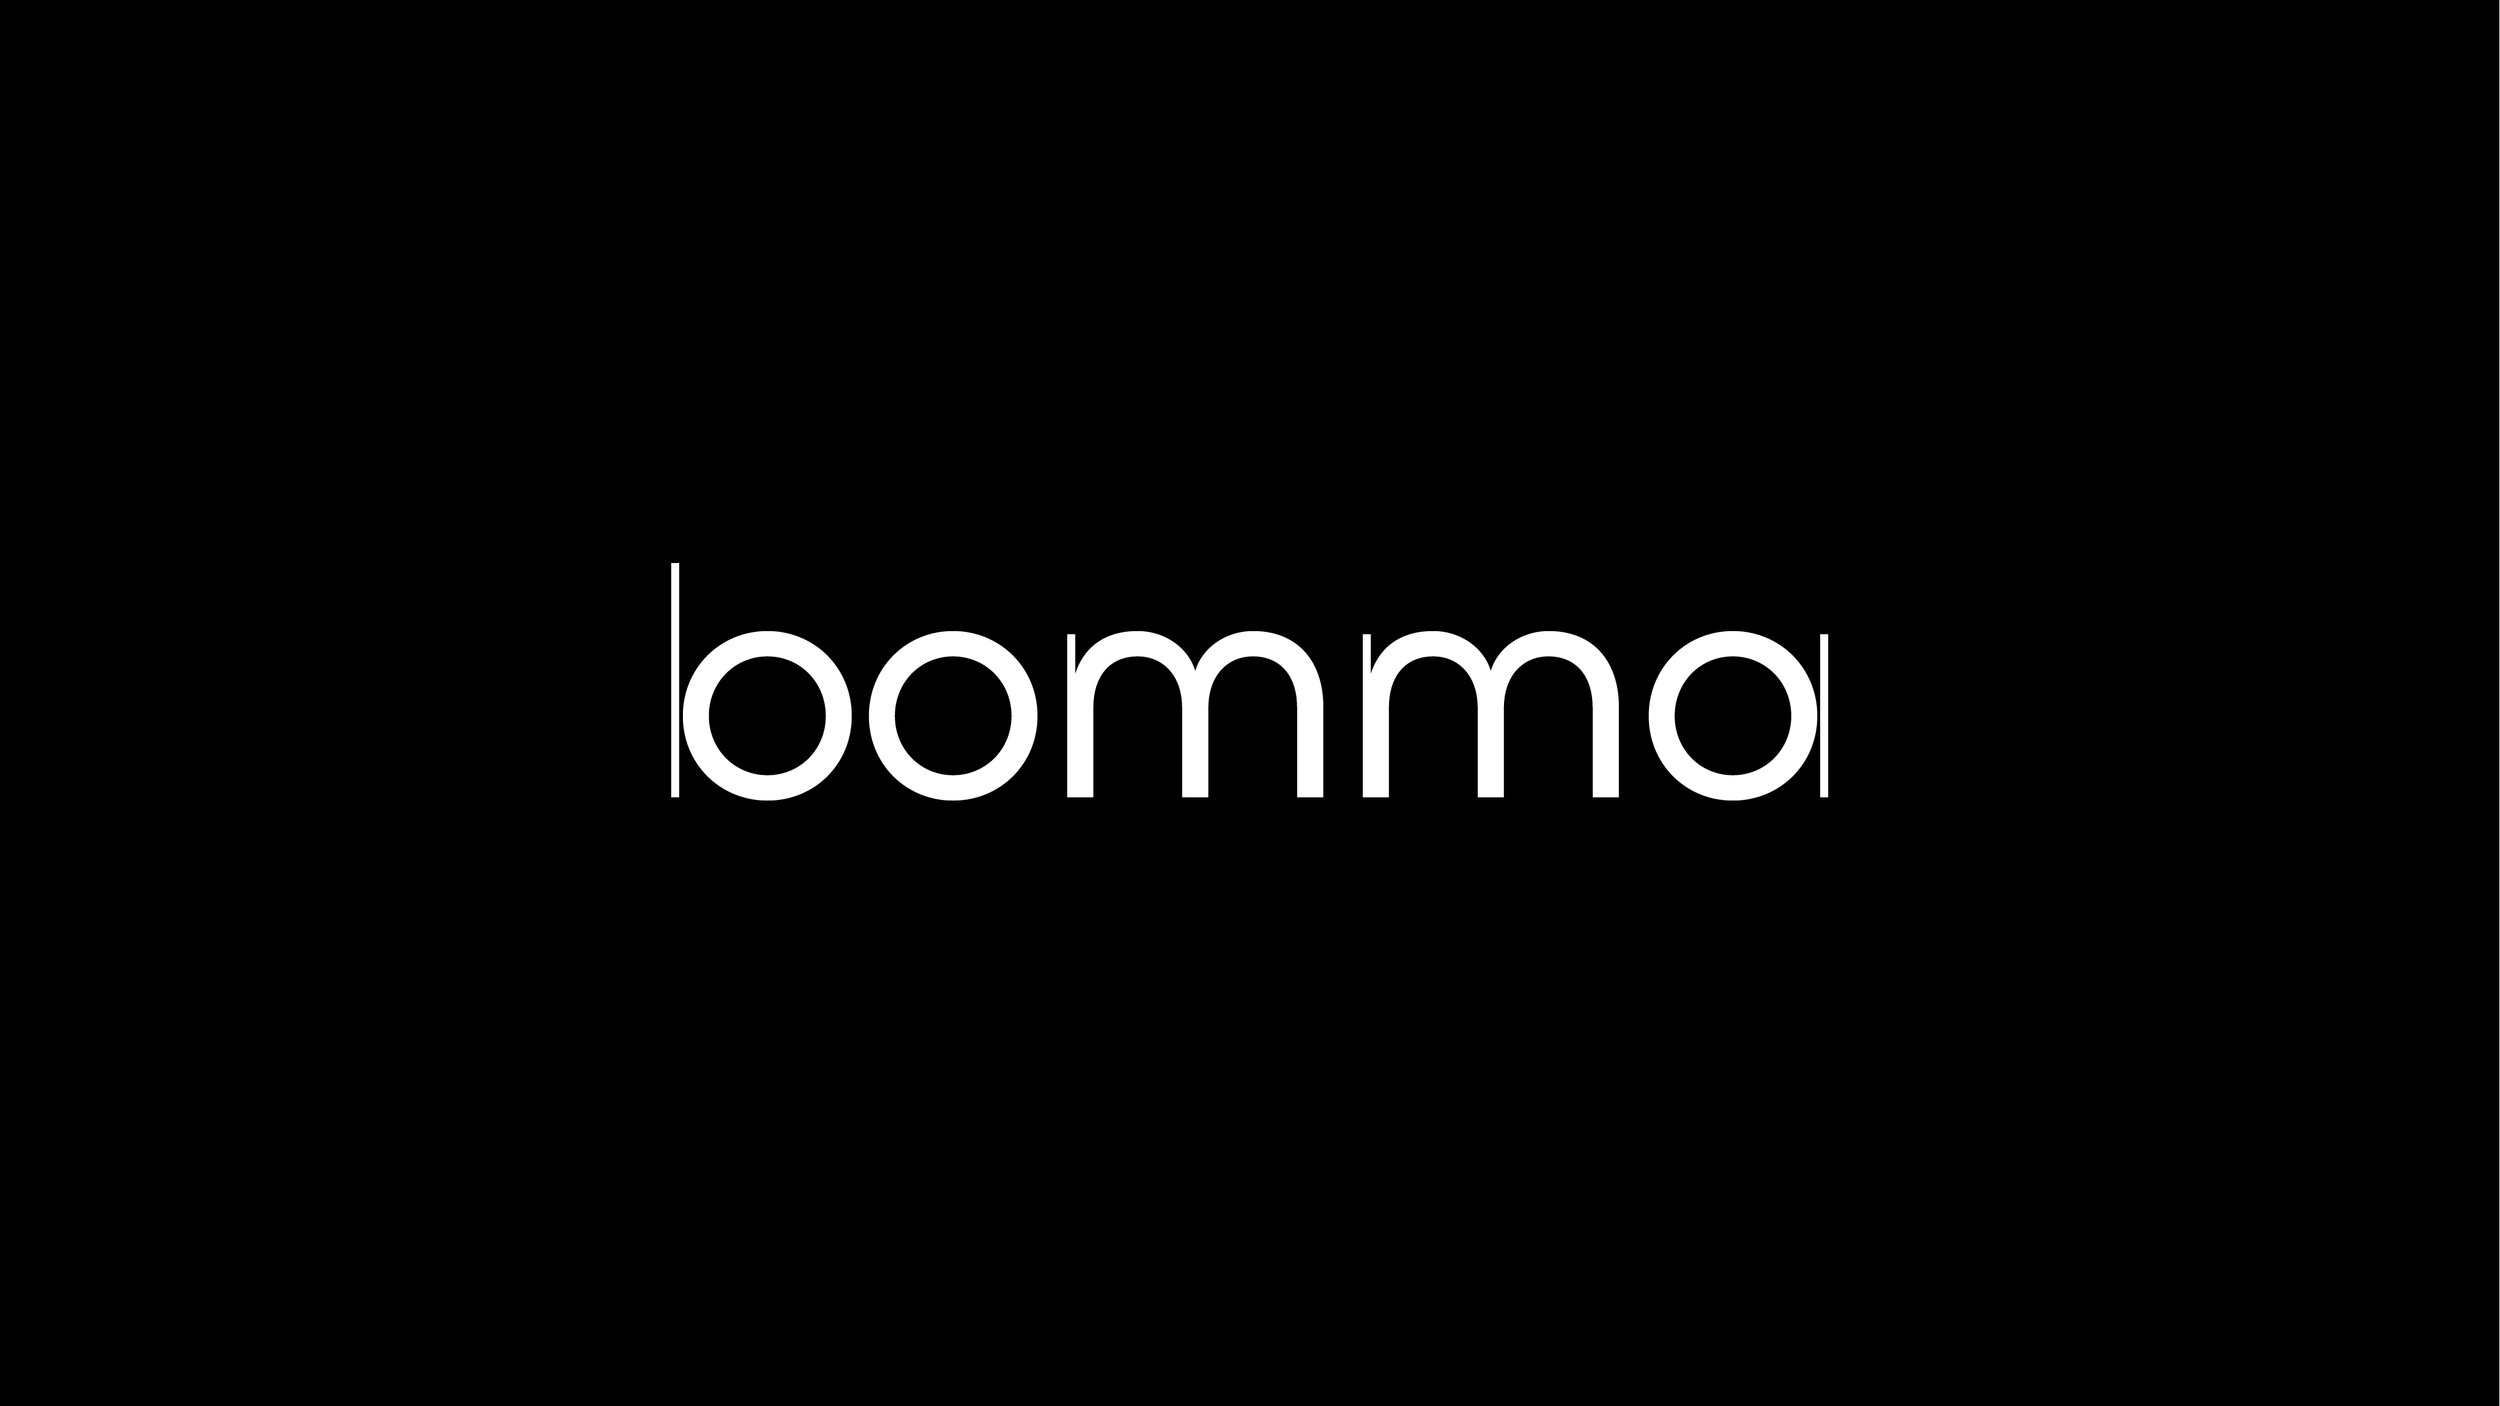 bomma-work-2.jpg